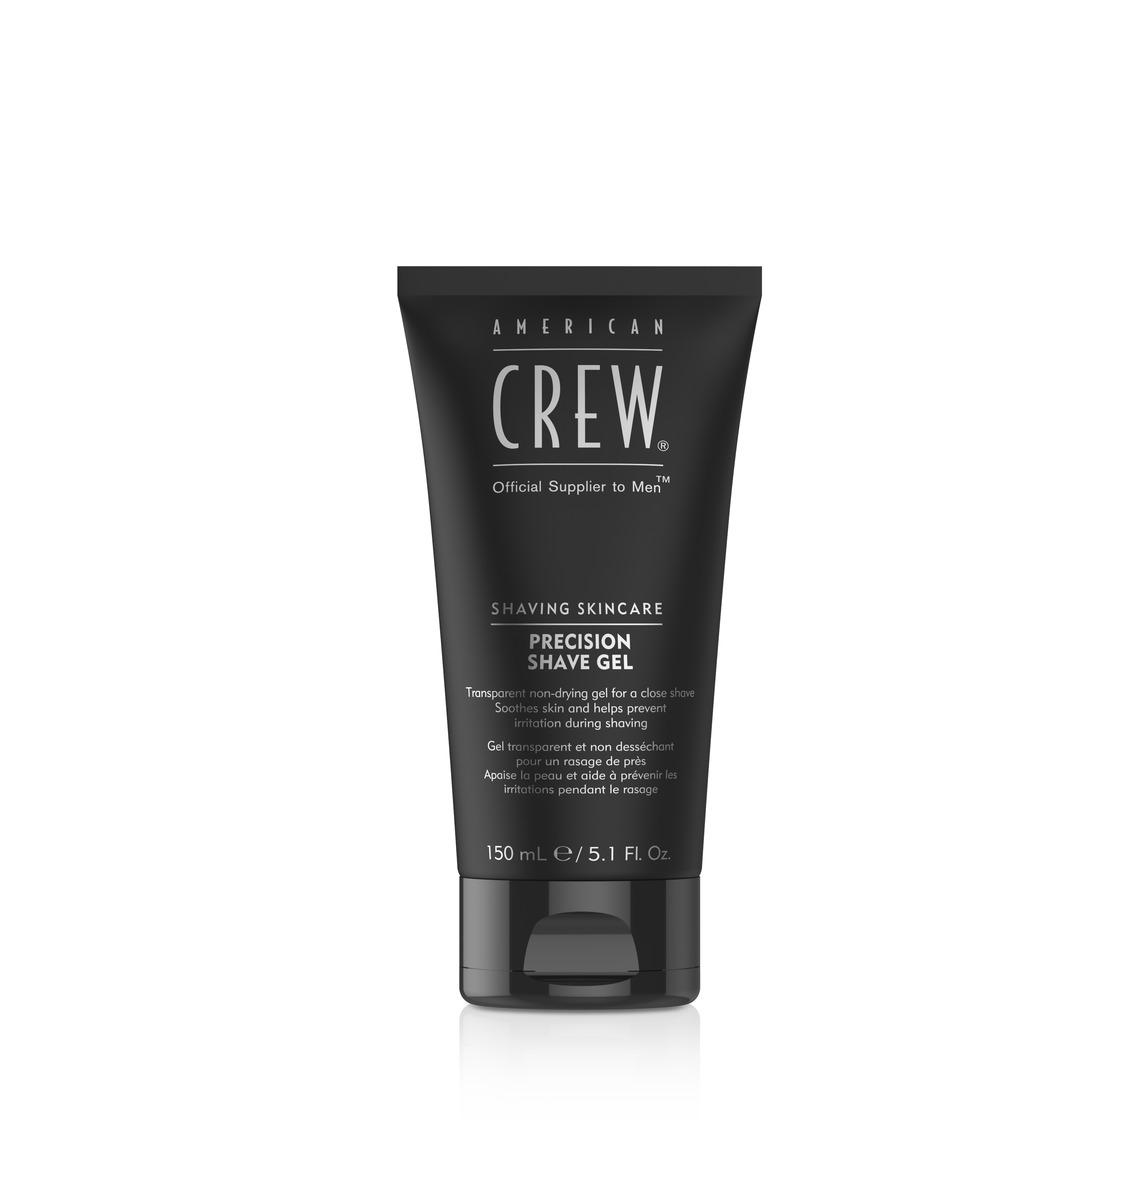 American Crew Precision Shave Gel, 150 ml